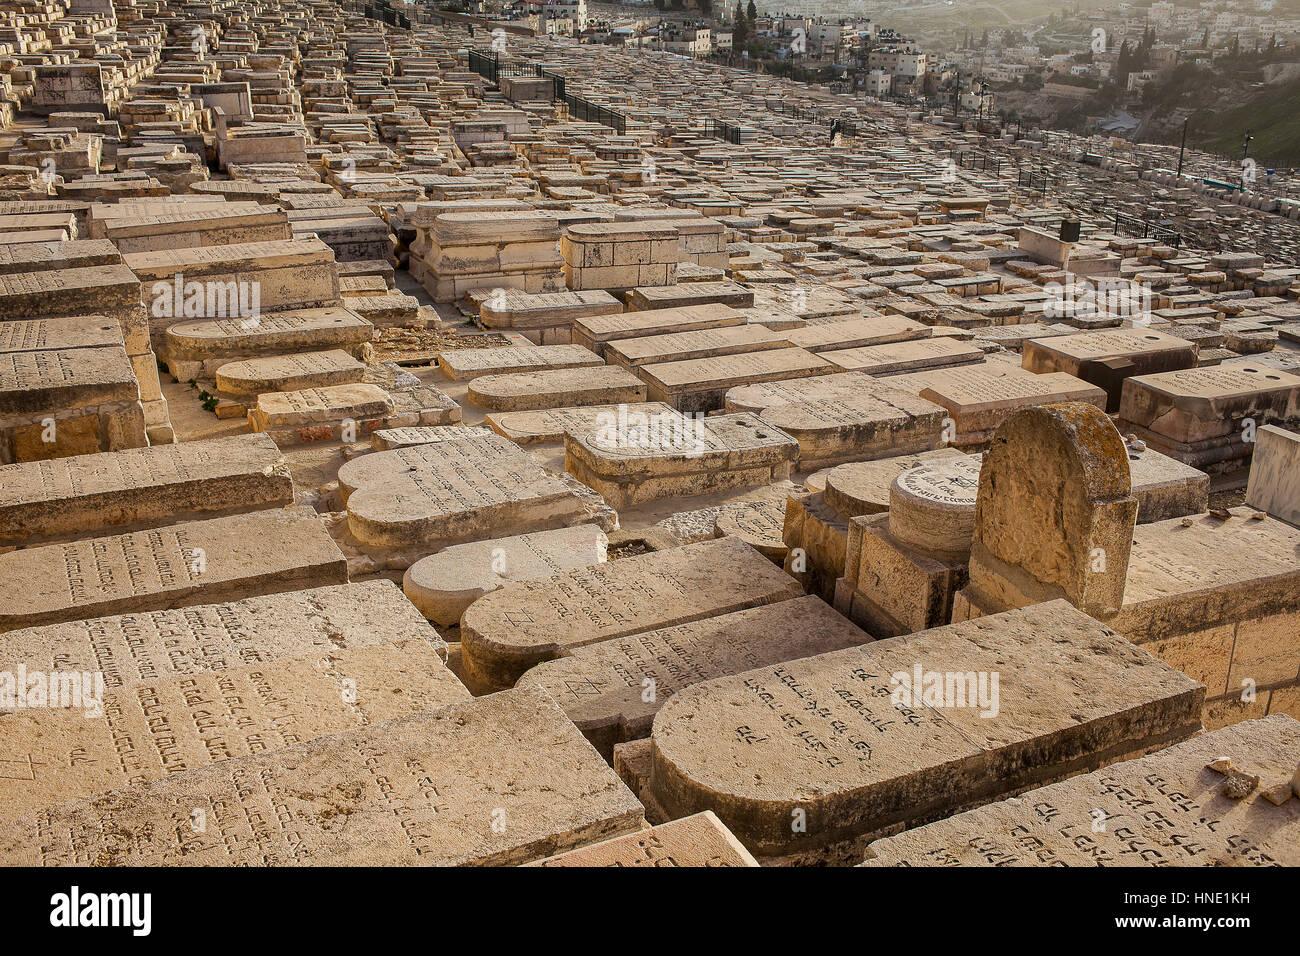 jewish cemetary, Mount of Olives, Jerusalem, Israel. - Stock Image